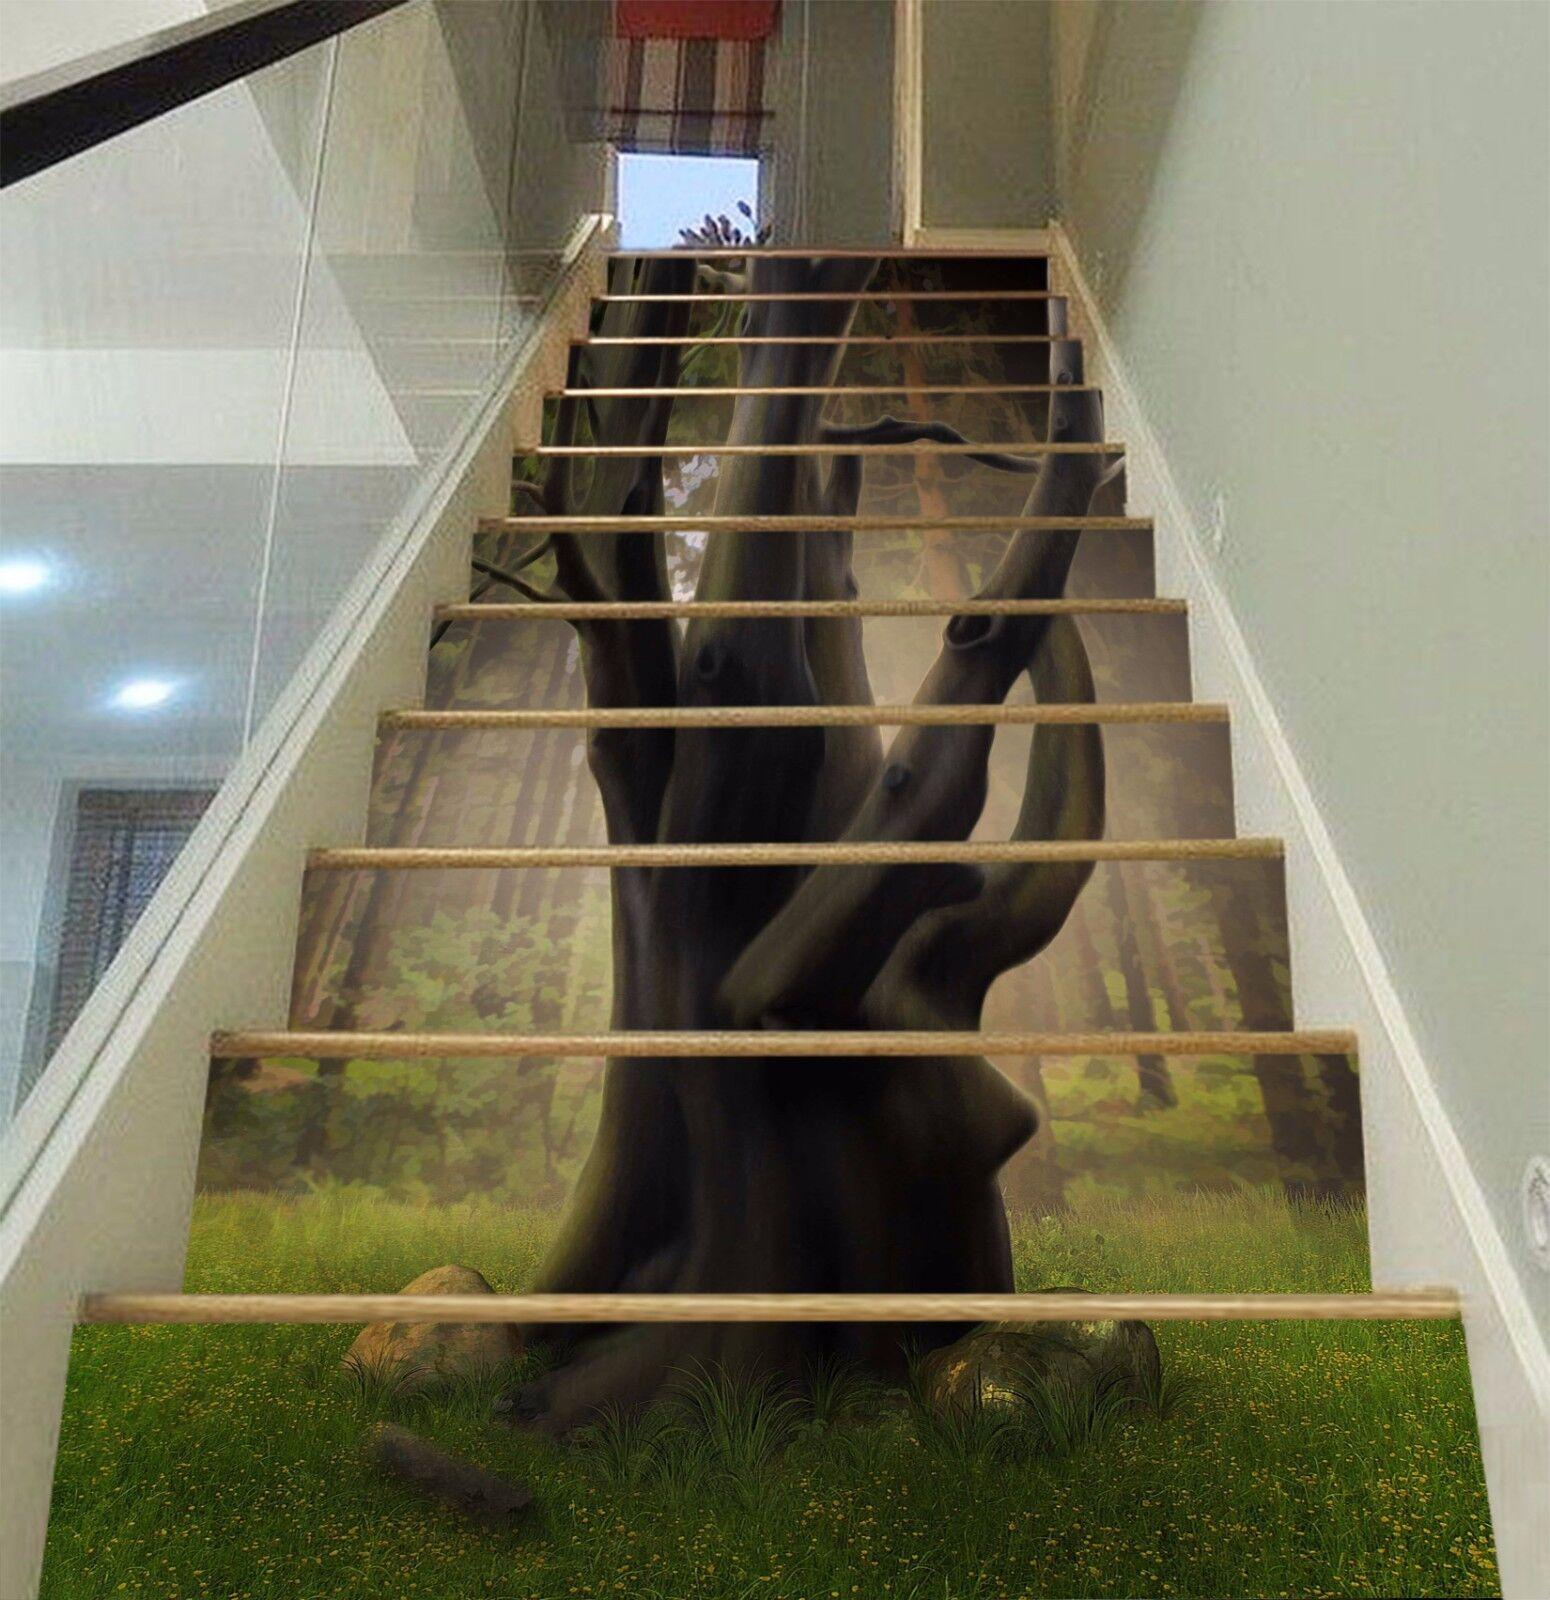 3D Forest Tree 914 Stair Risers Decoration Photo Mural Vinyl Decal WandPapier AU